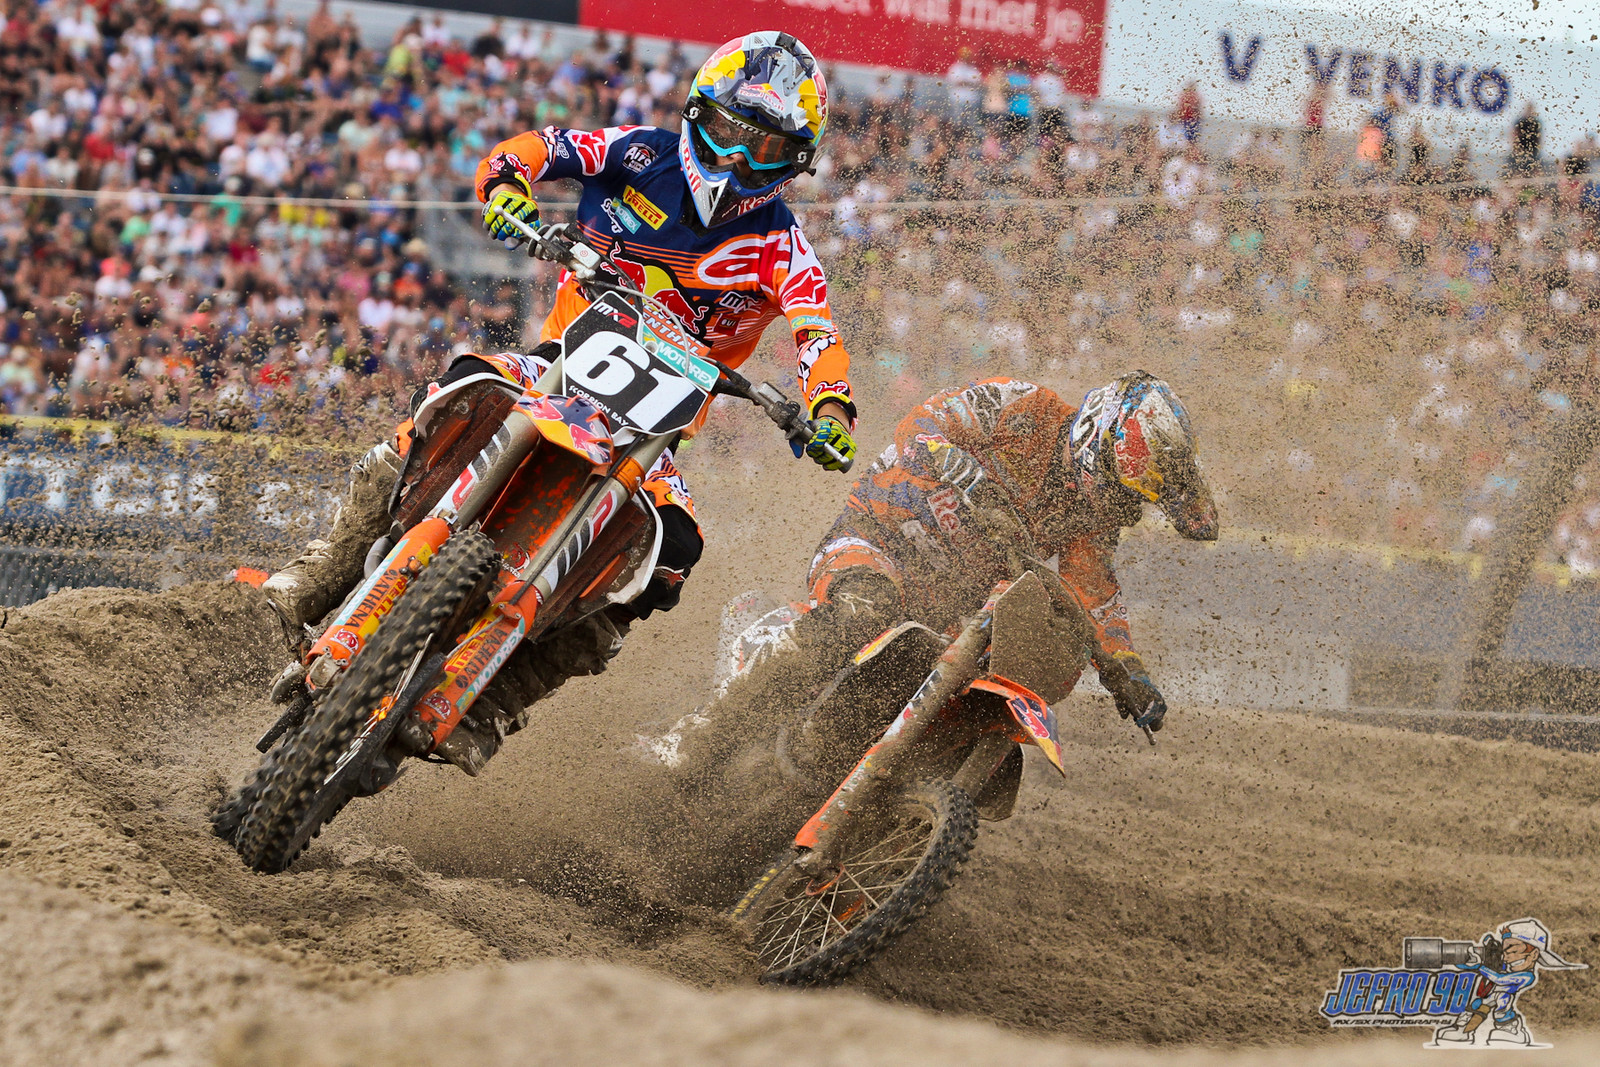 Jorge Prado & Jeffrey Herlings - Photo Gallery: MXGP of the Netherlands - Motocross Pictures - Vital MX